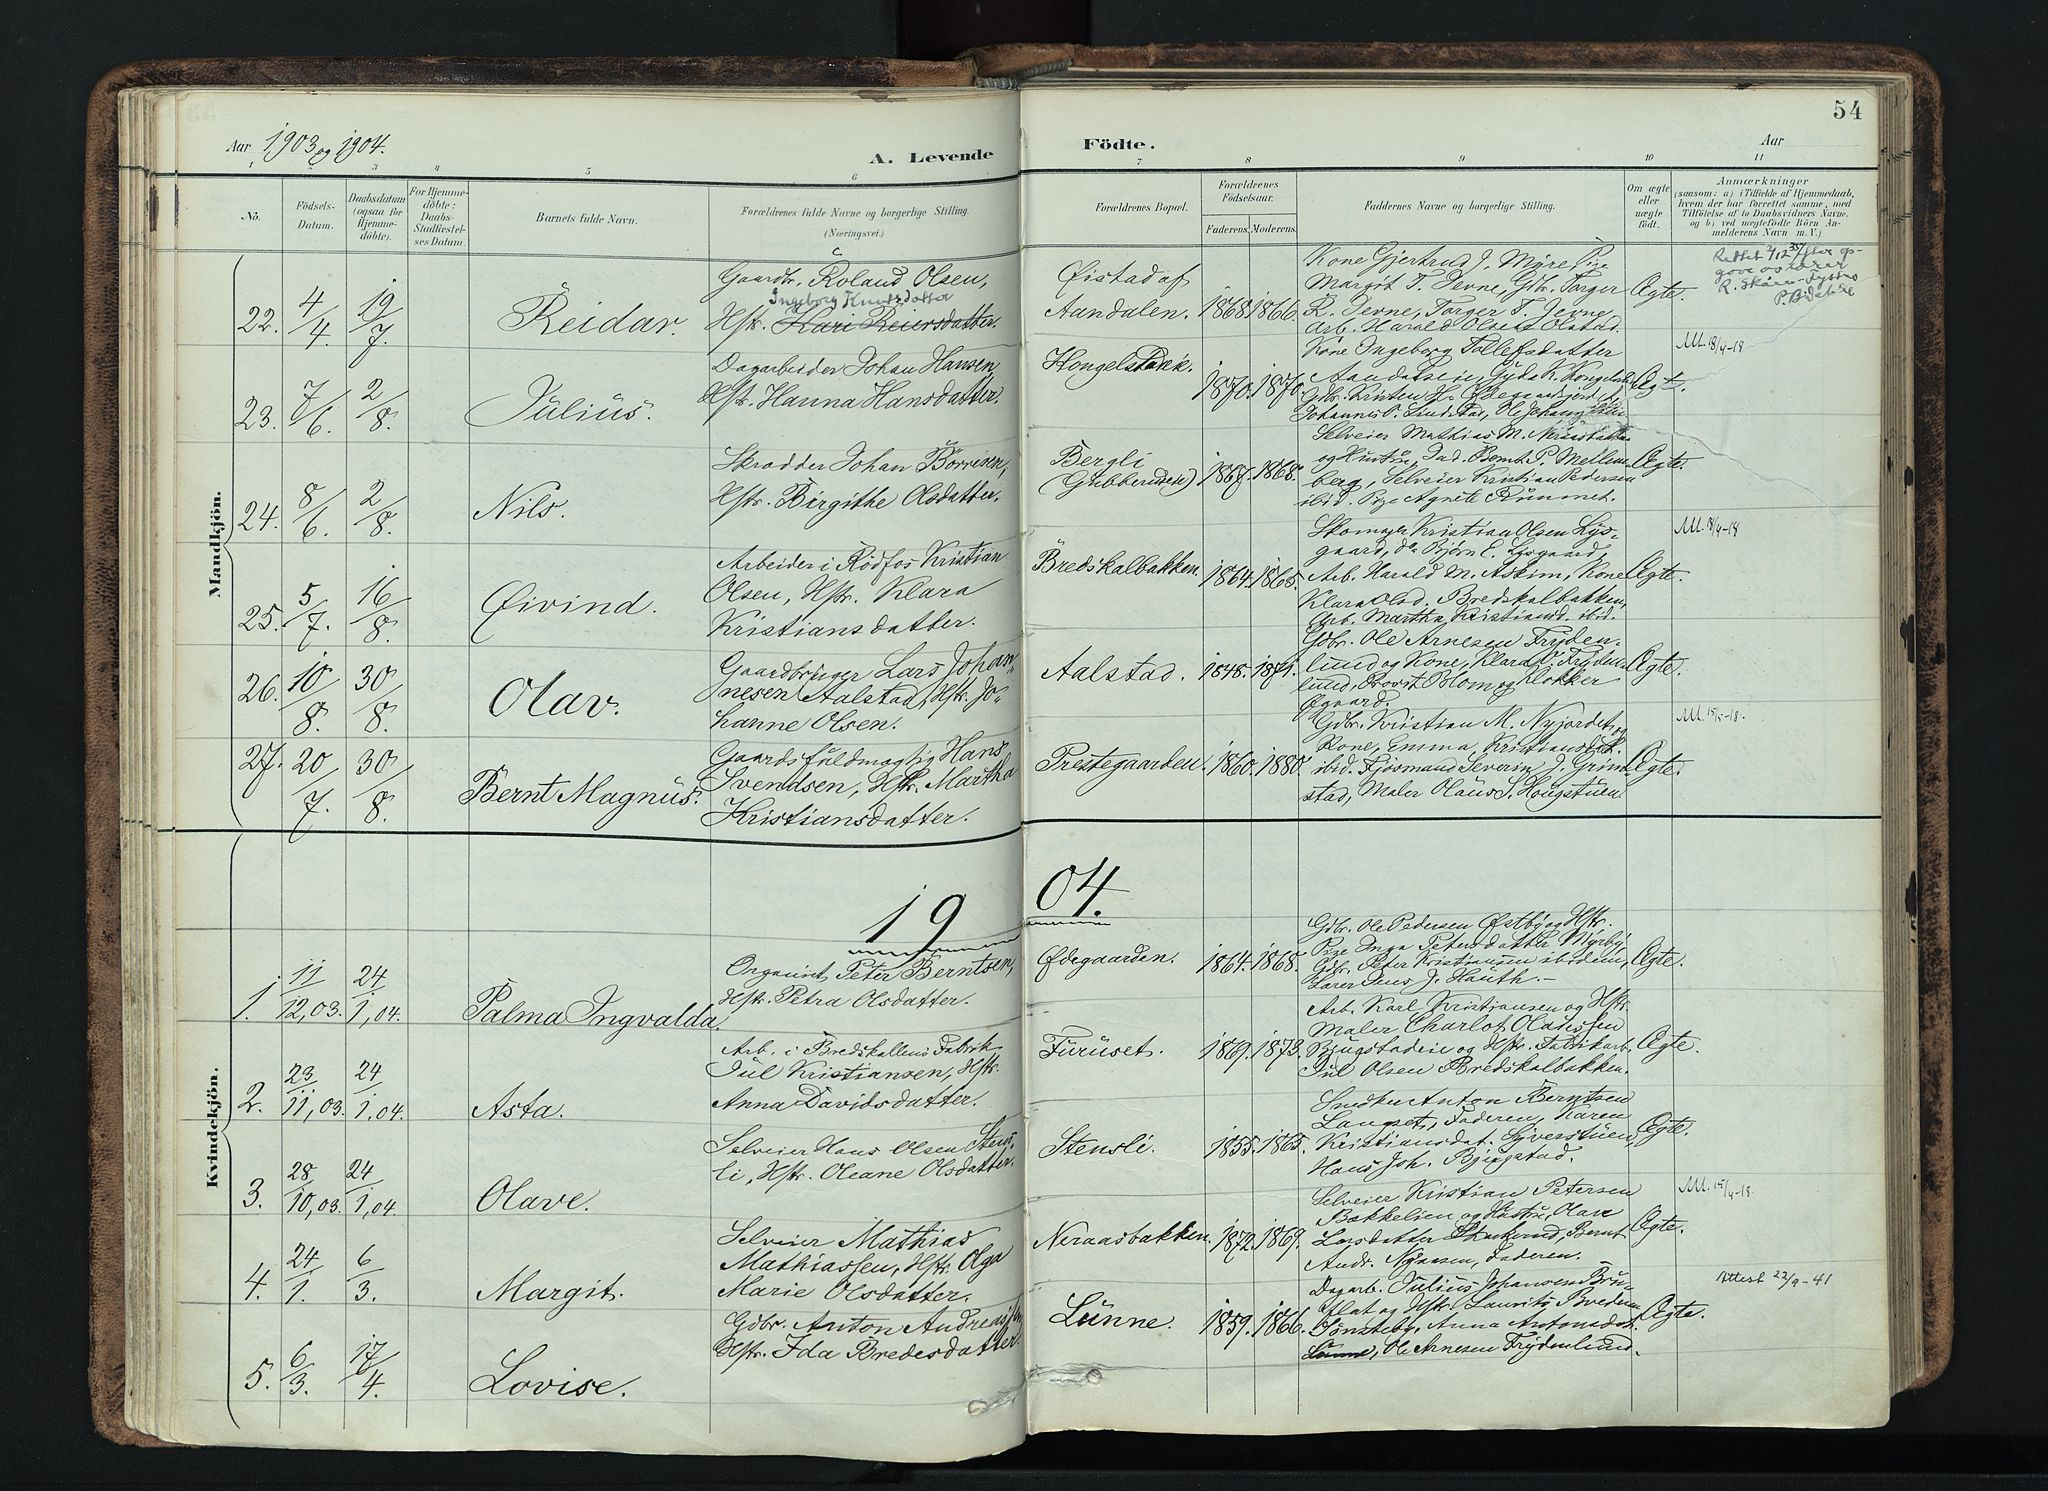 SAH, Vardal prestekontor, H/Ha/Haa/L0019: Ministerialbok nr. 19, 1893-1907, s. 54